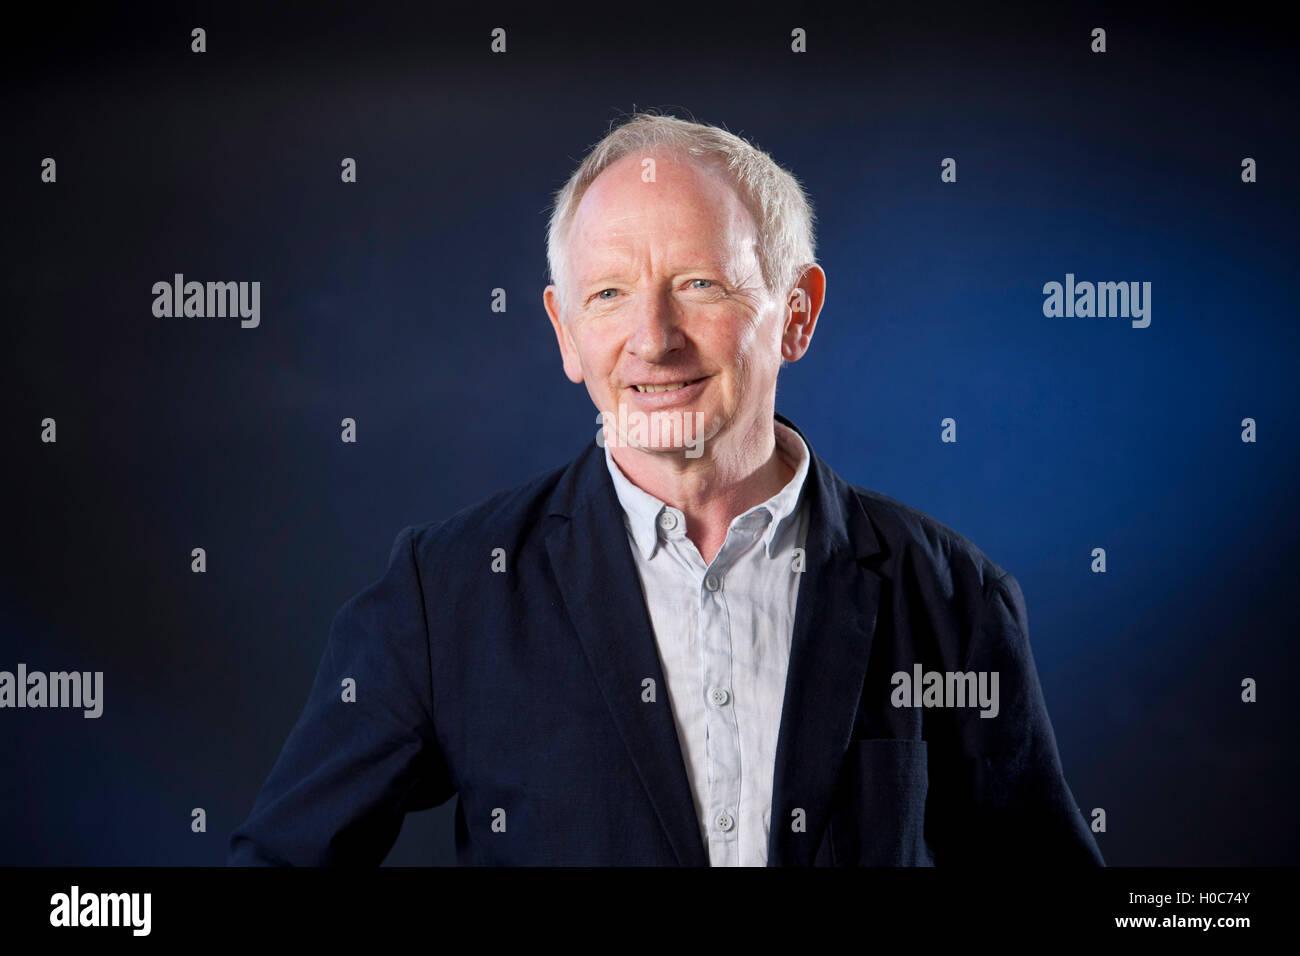 Alan Taylor, the Scottish journalist and author, at the Edinburgh International Book Festival. Edinburgh, Scotland. - Stock Image